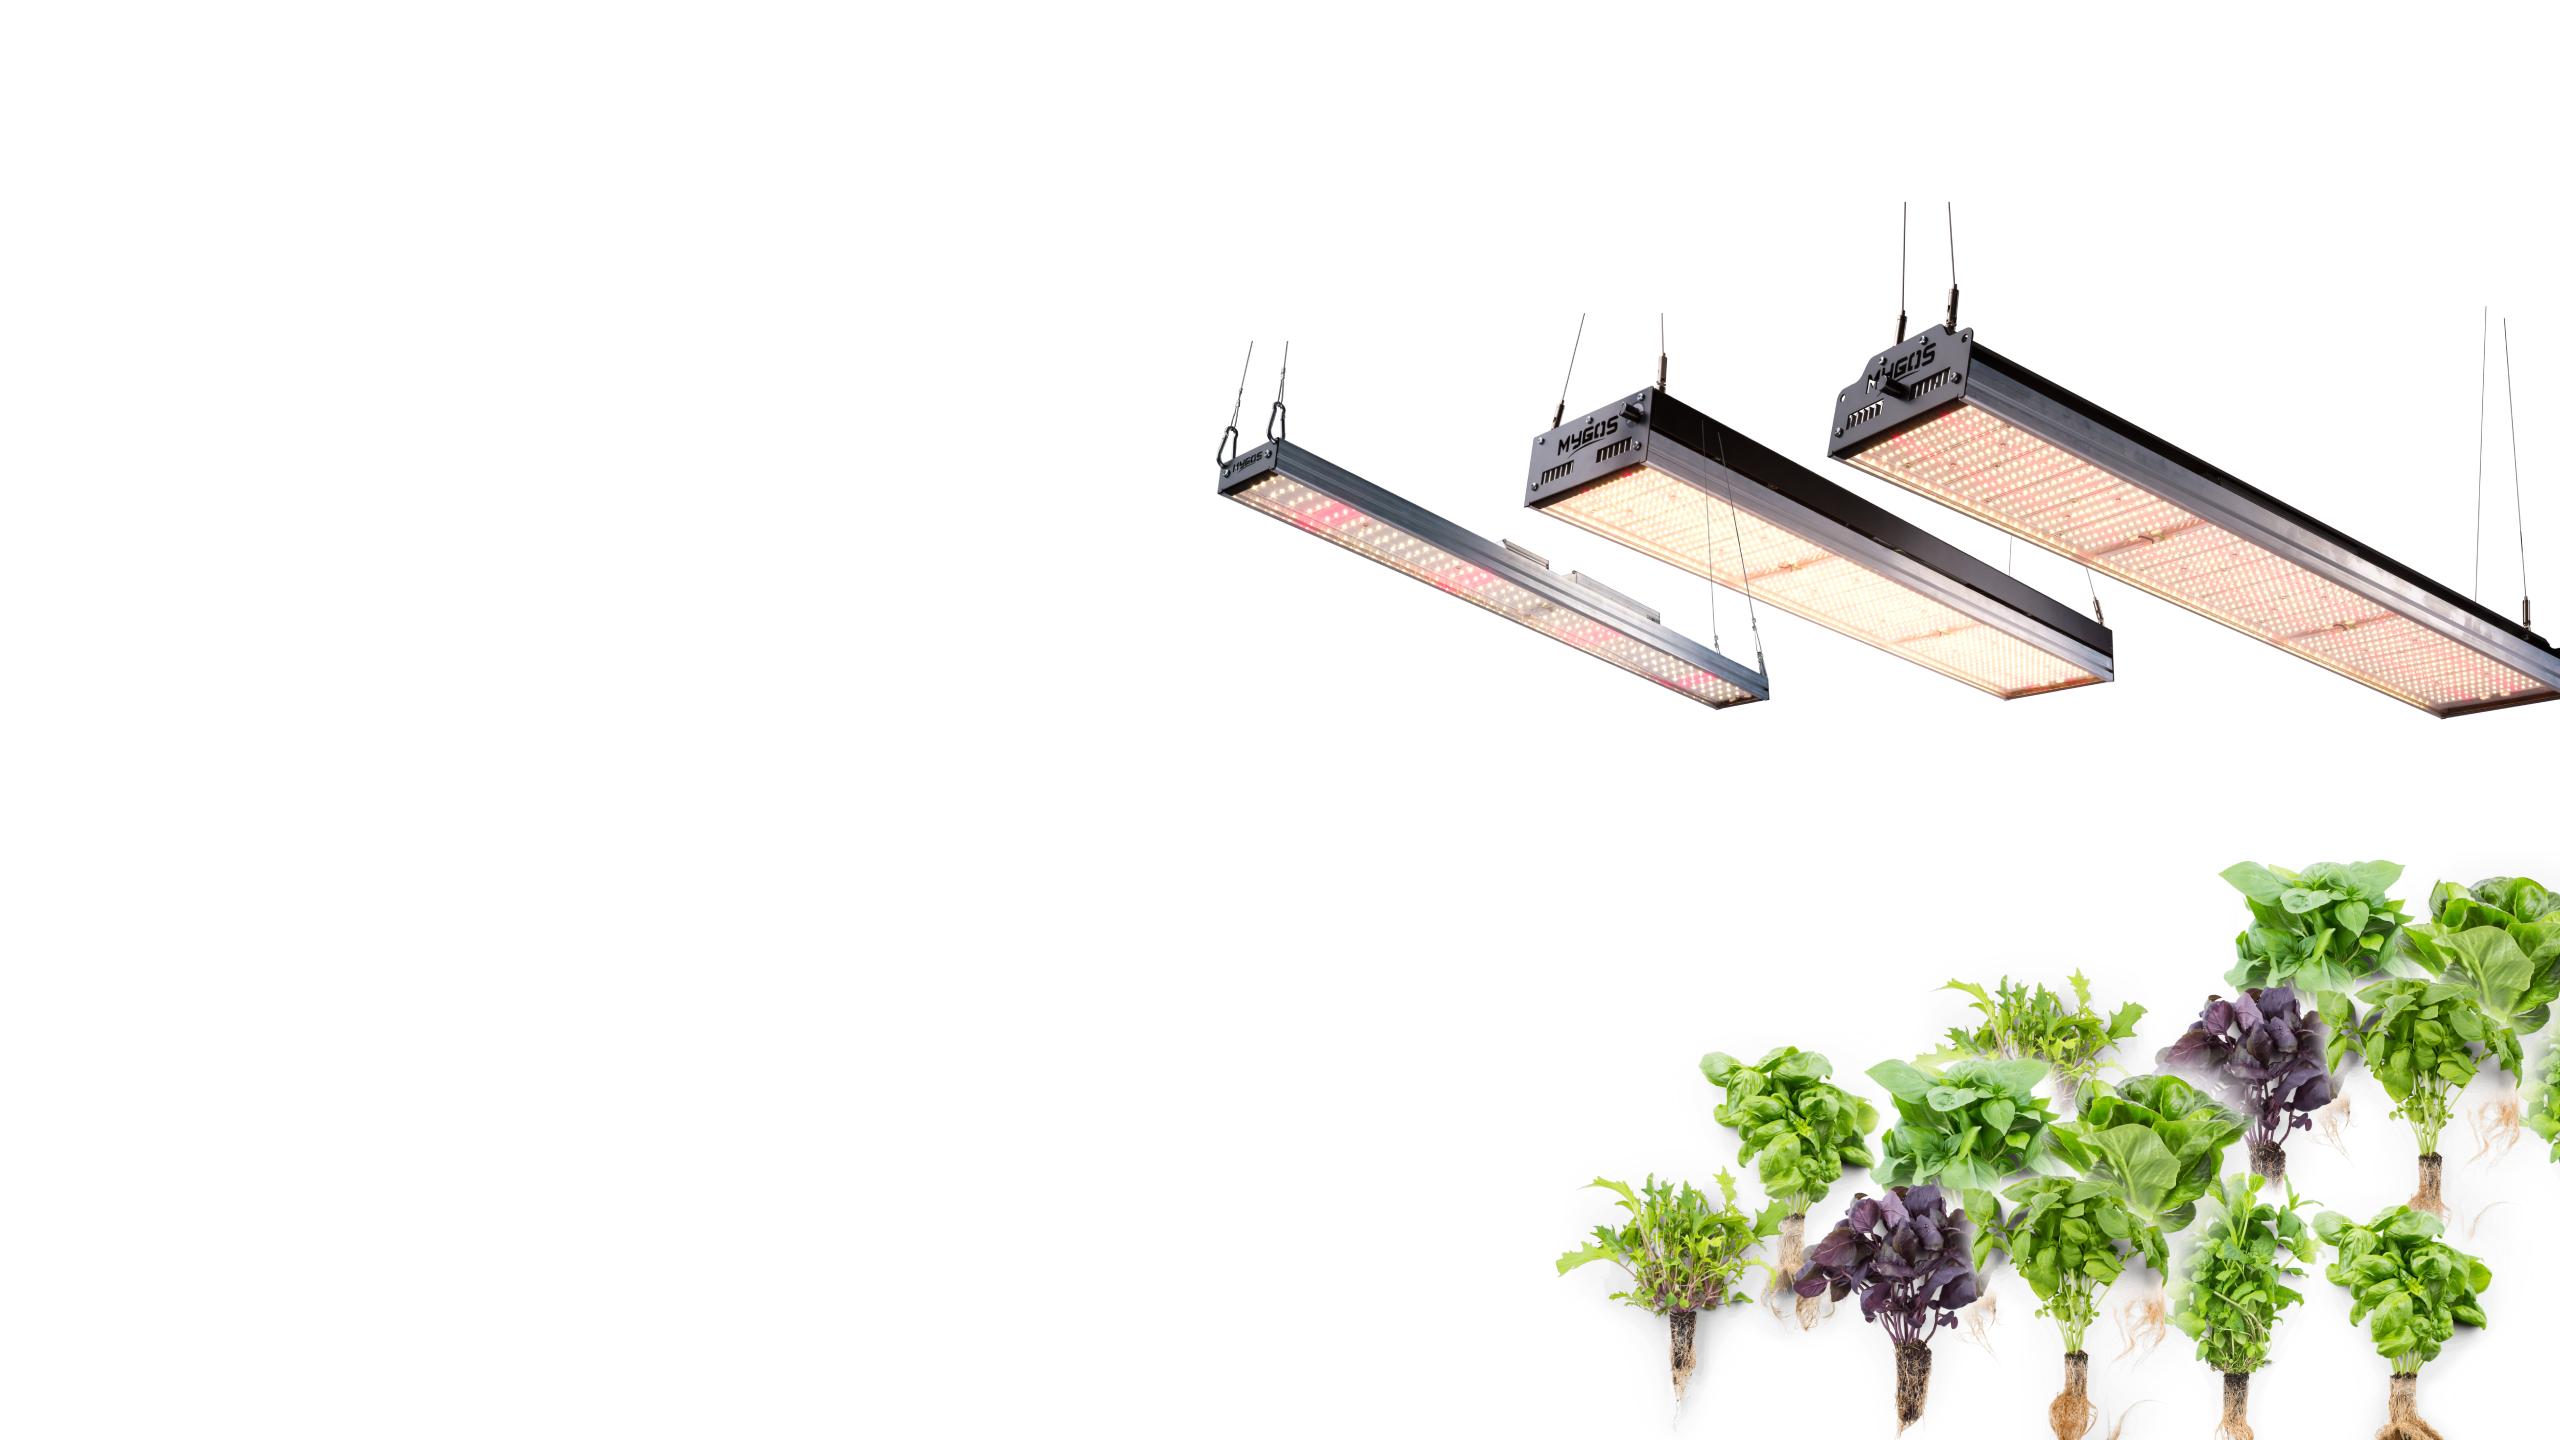 Parallax-bg_all-growlight-products.jpg